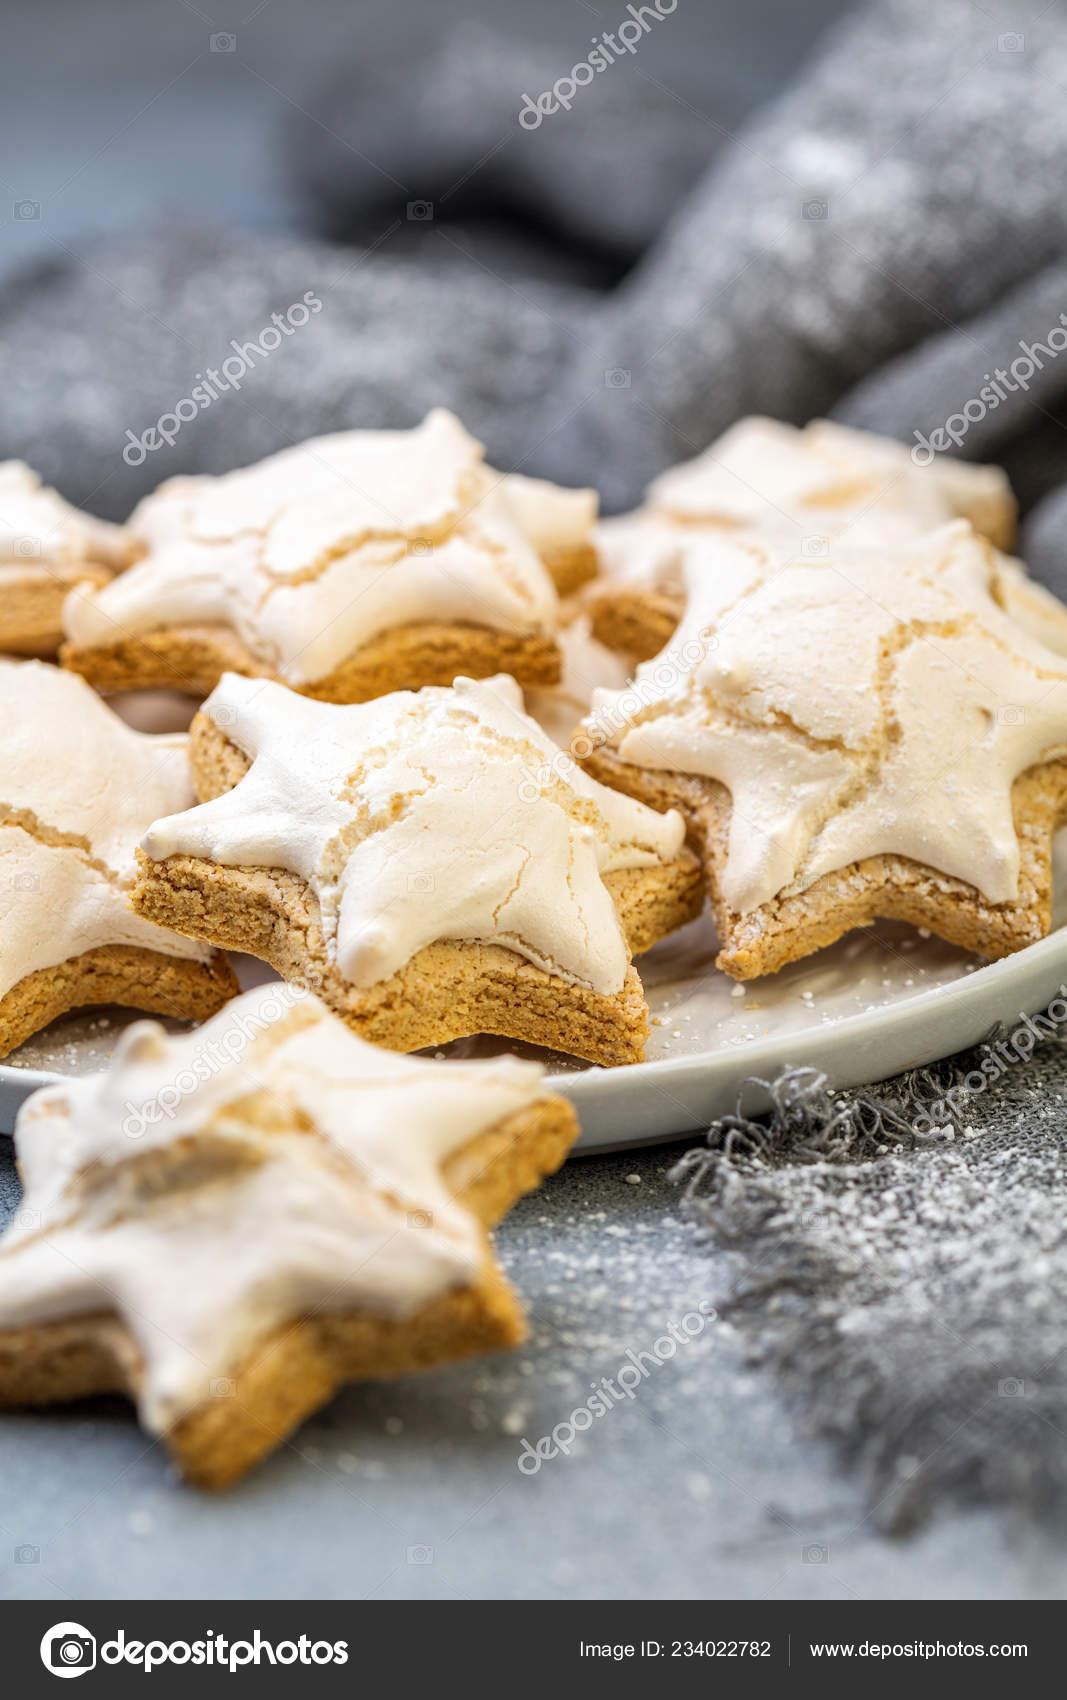 Homemade German Cinnamon Cookies Shape Star Plate Gray Concrete